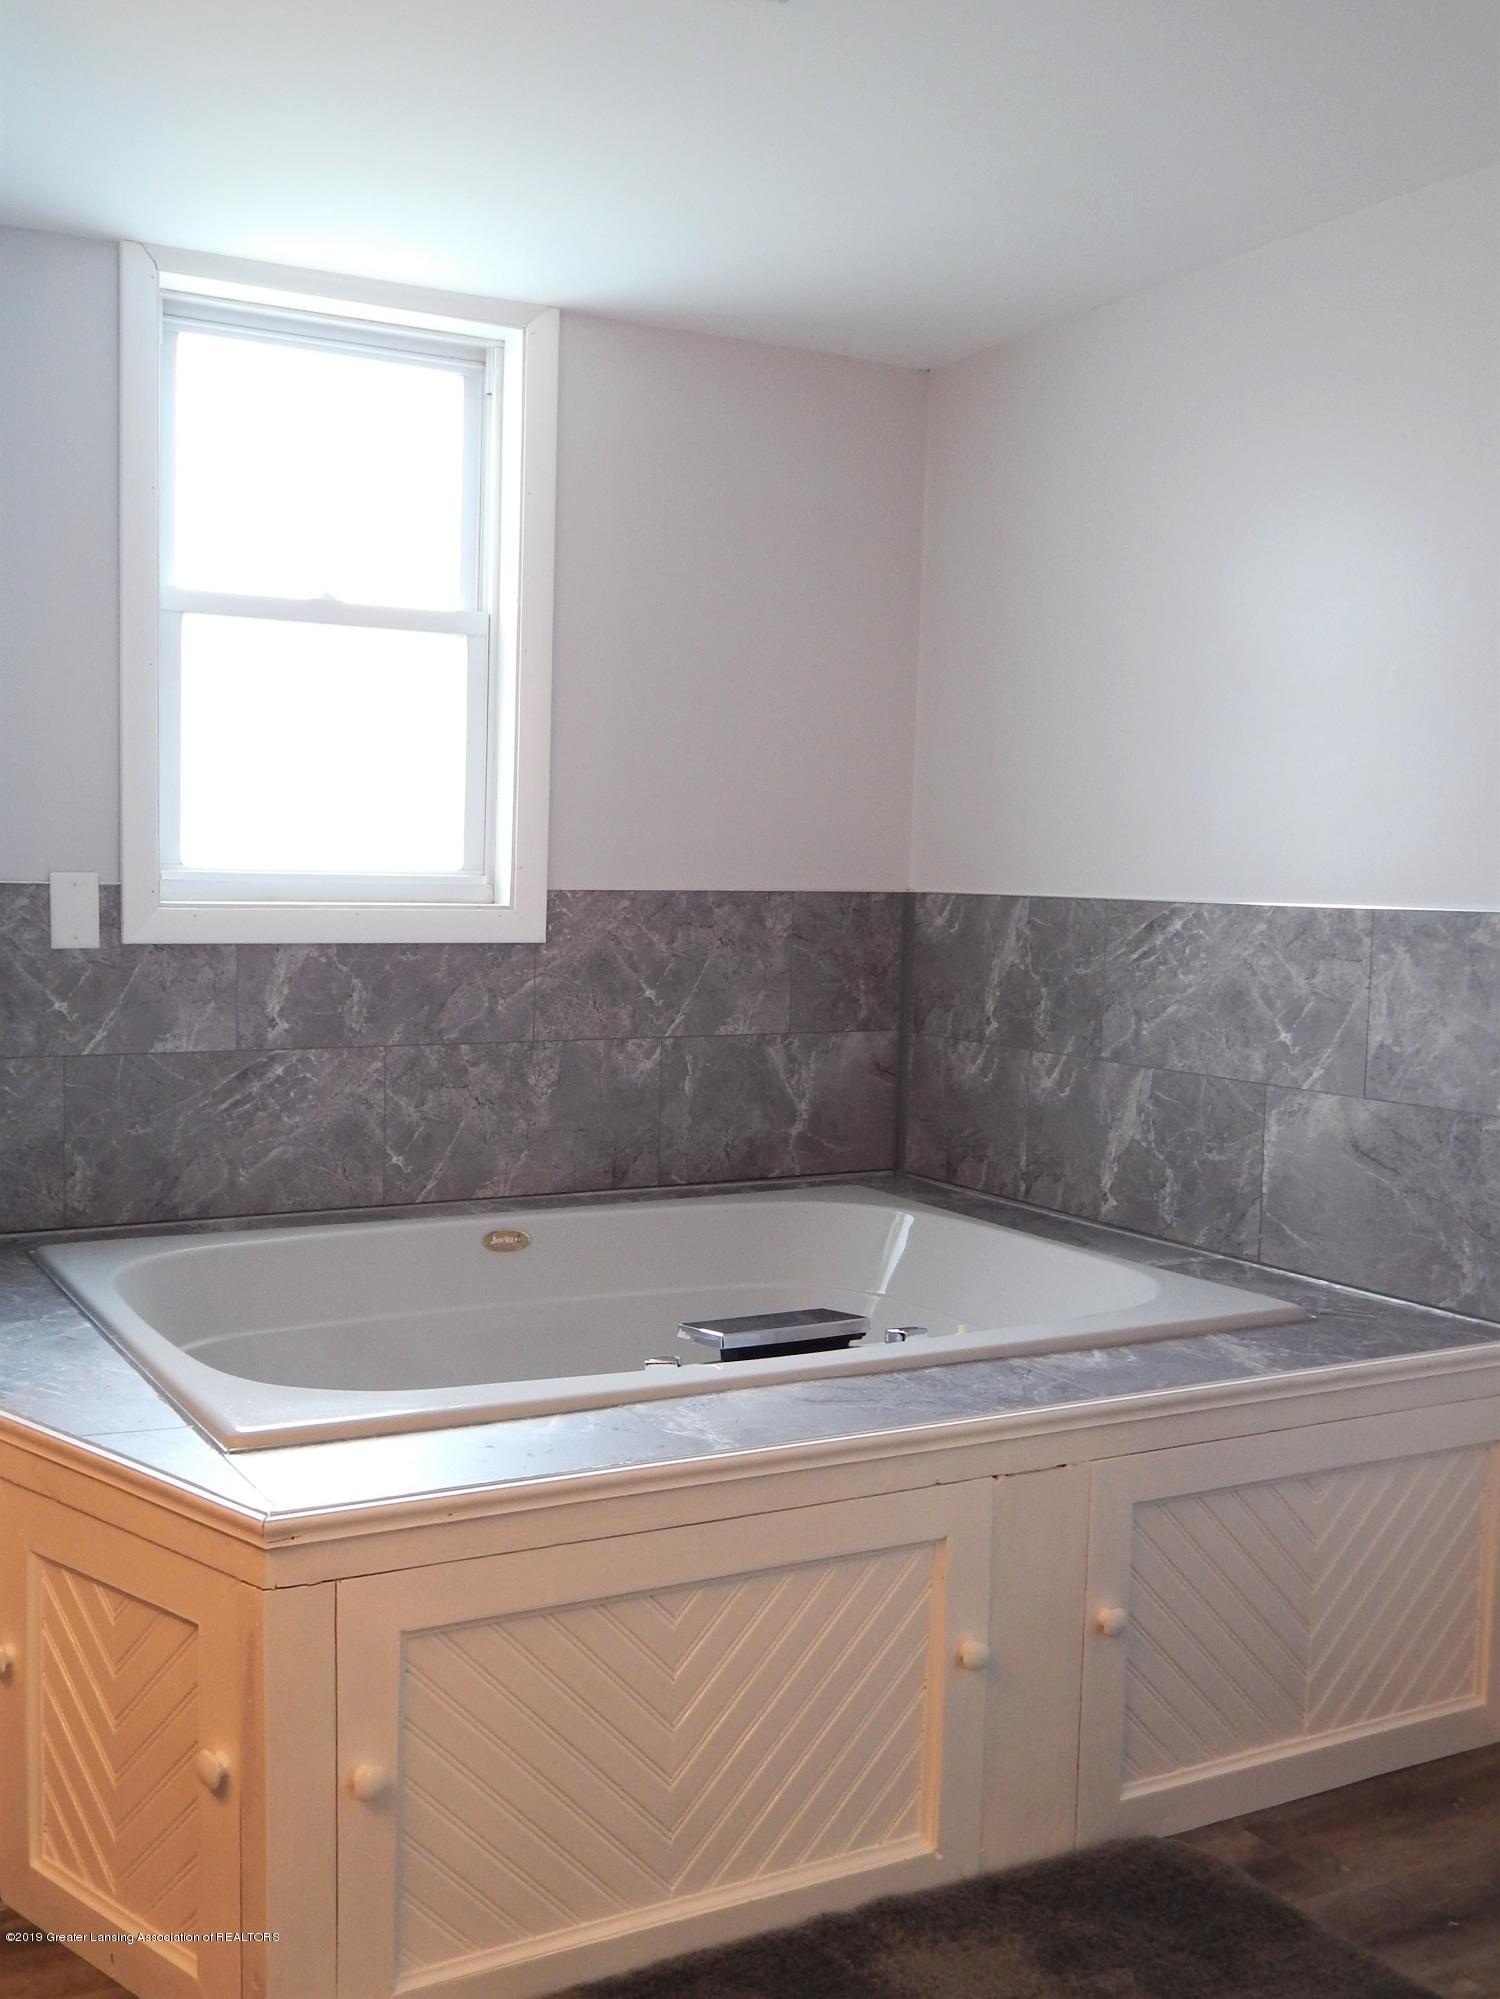 2605 Hazelwood Dr - Bathroom - 12